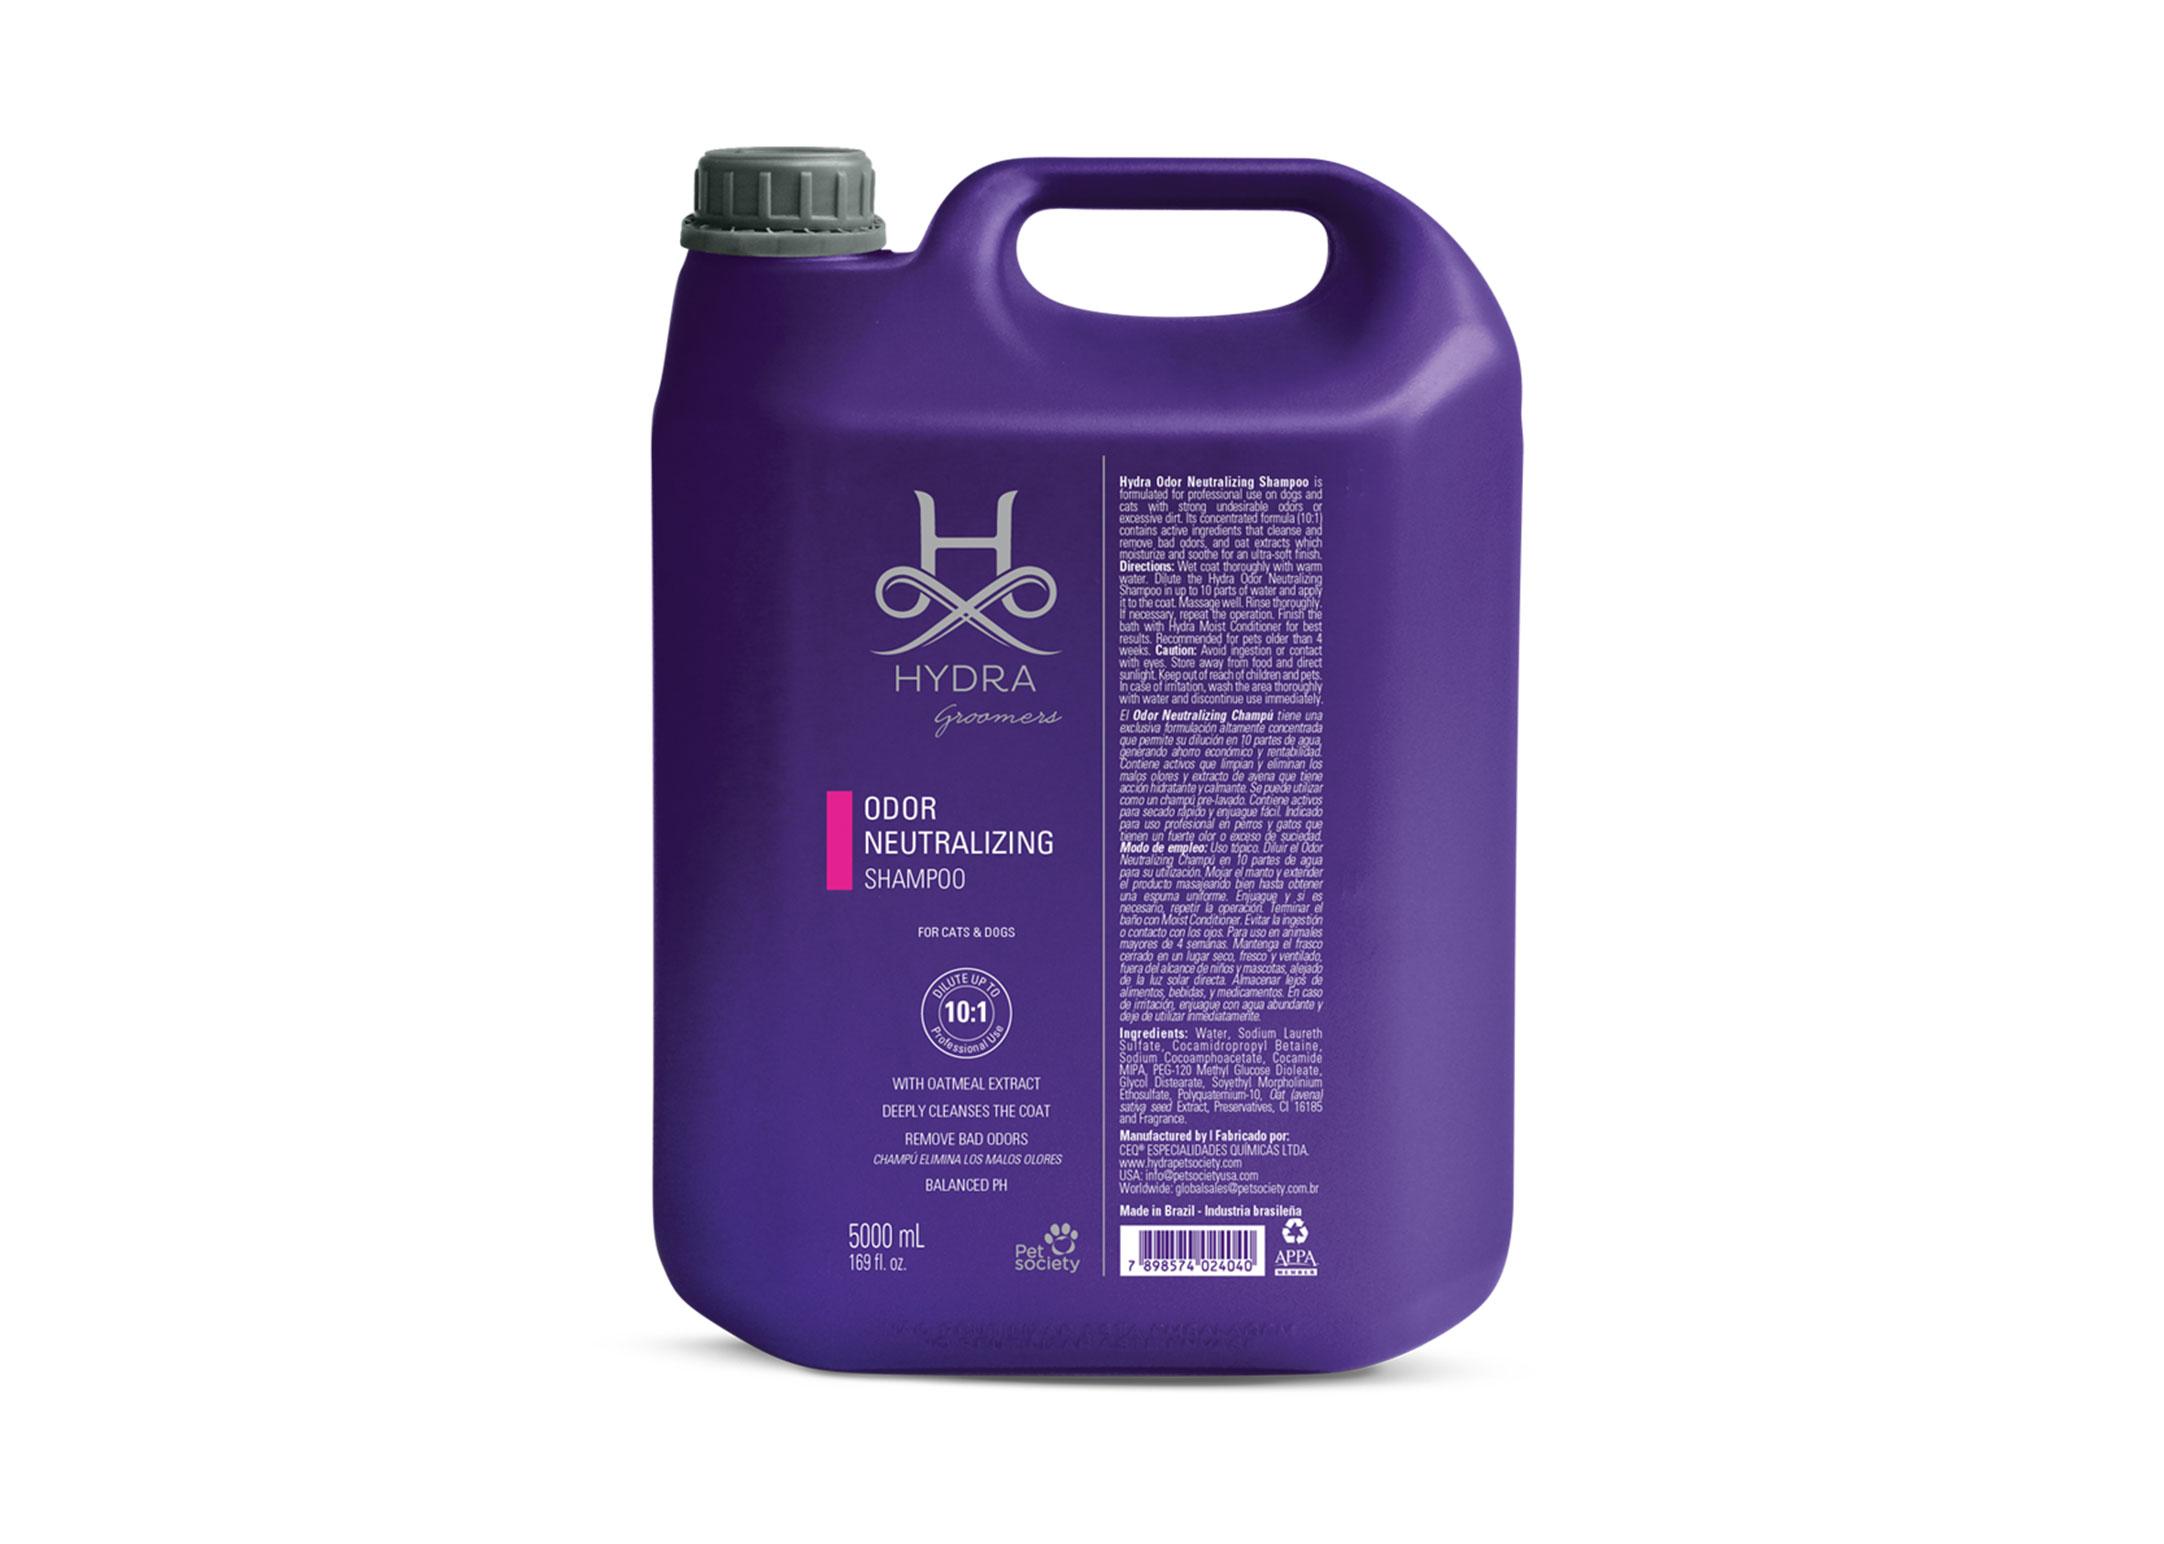 Hydra Odor Neutralizing Shampoo